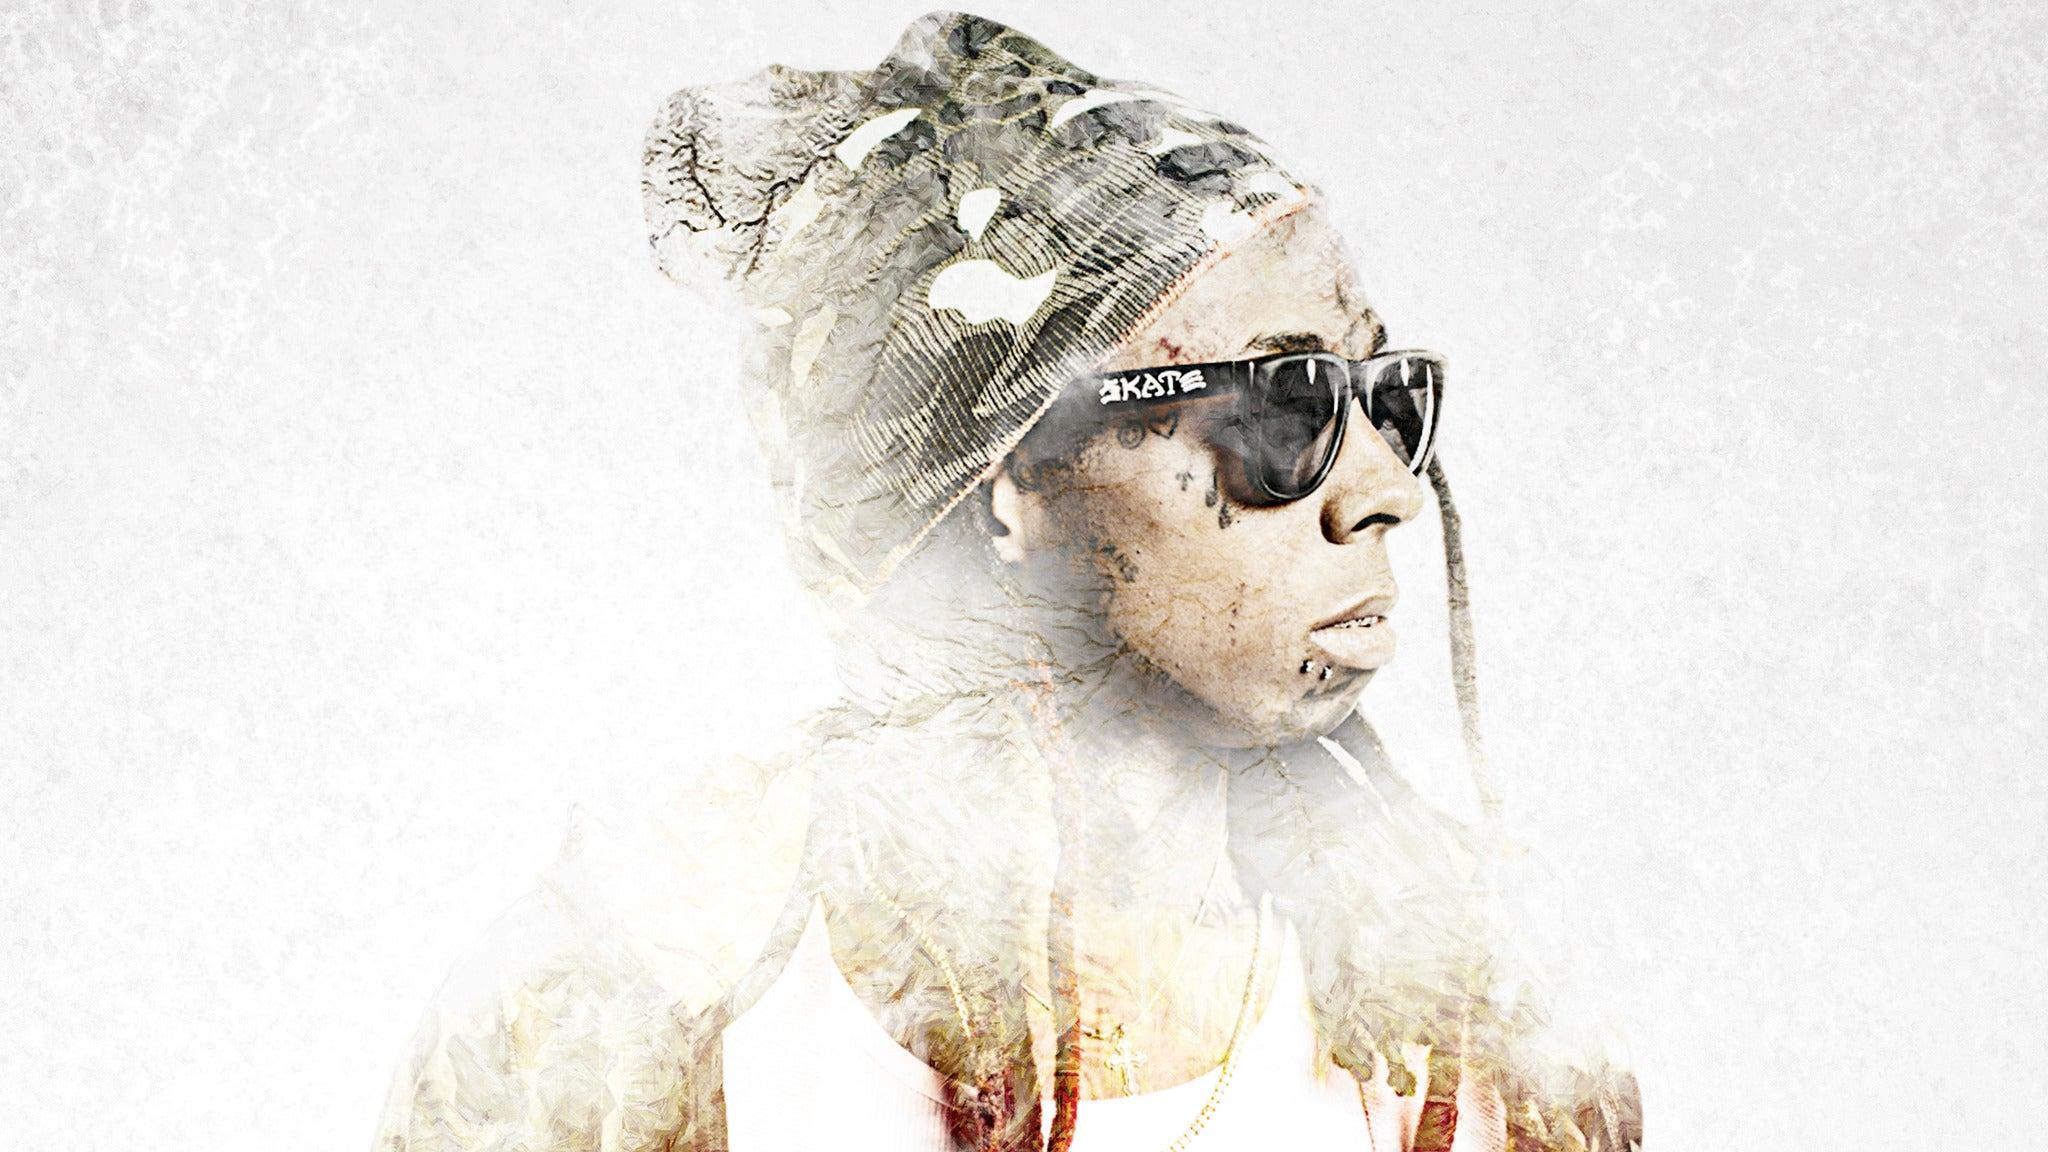 Lil Wayne at Toyota Center Kennewick